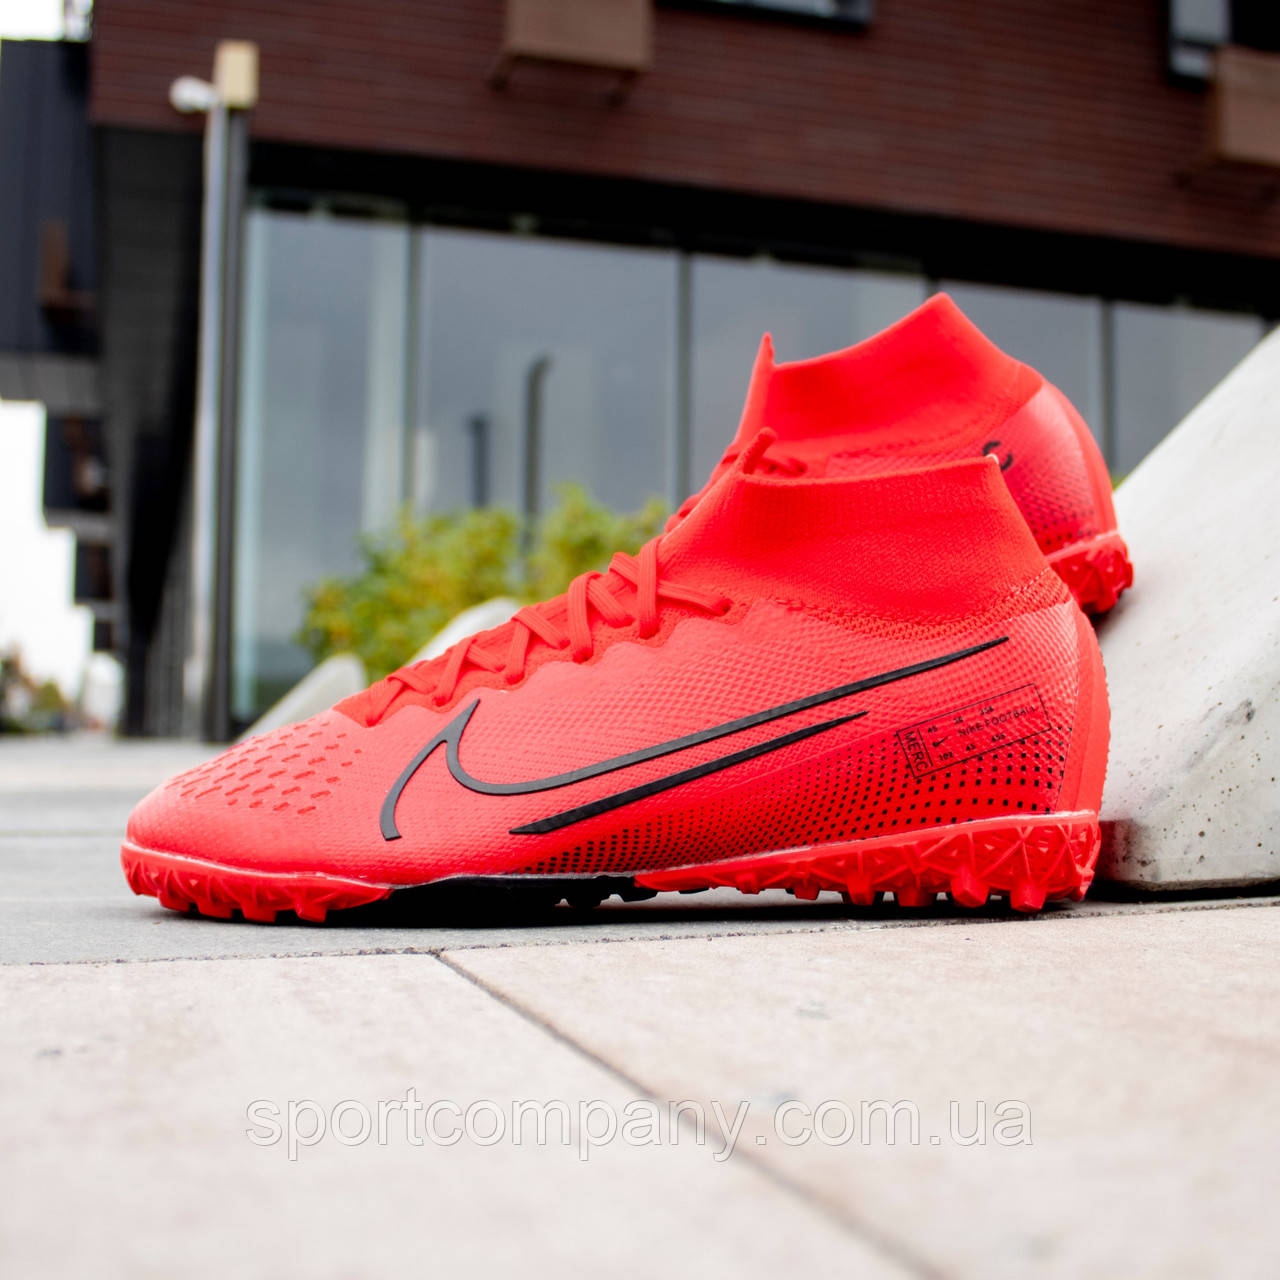 Сороконожки Nike Mercurial Superfly 7 Elite (39-45)